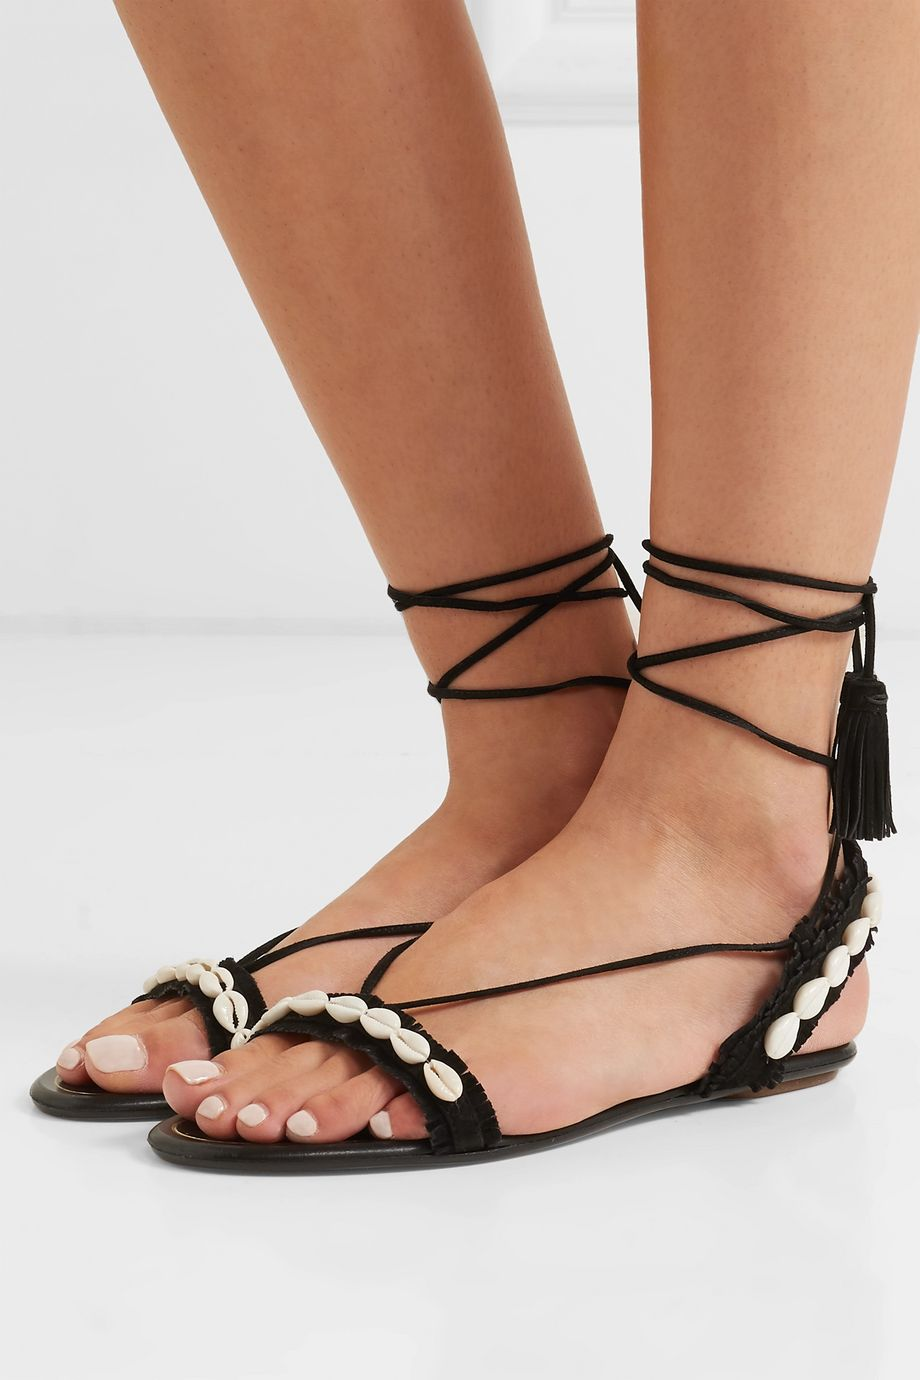 Aquazzura Honolulu suede and shell sandals